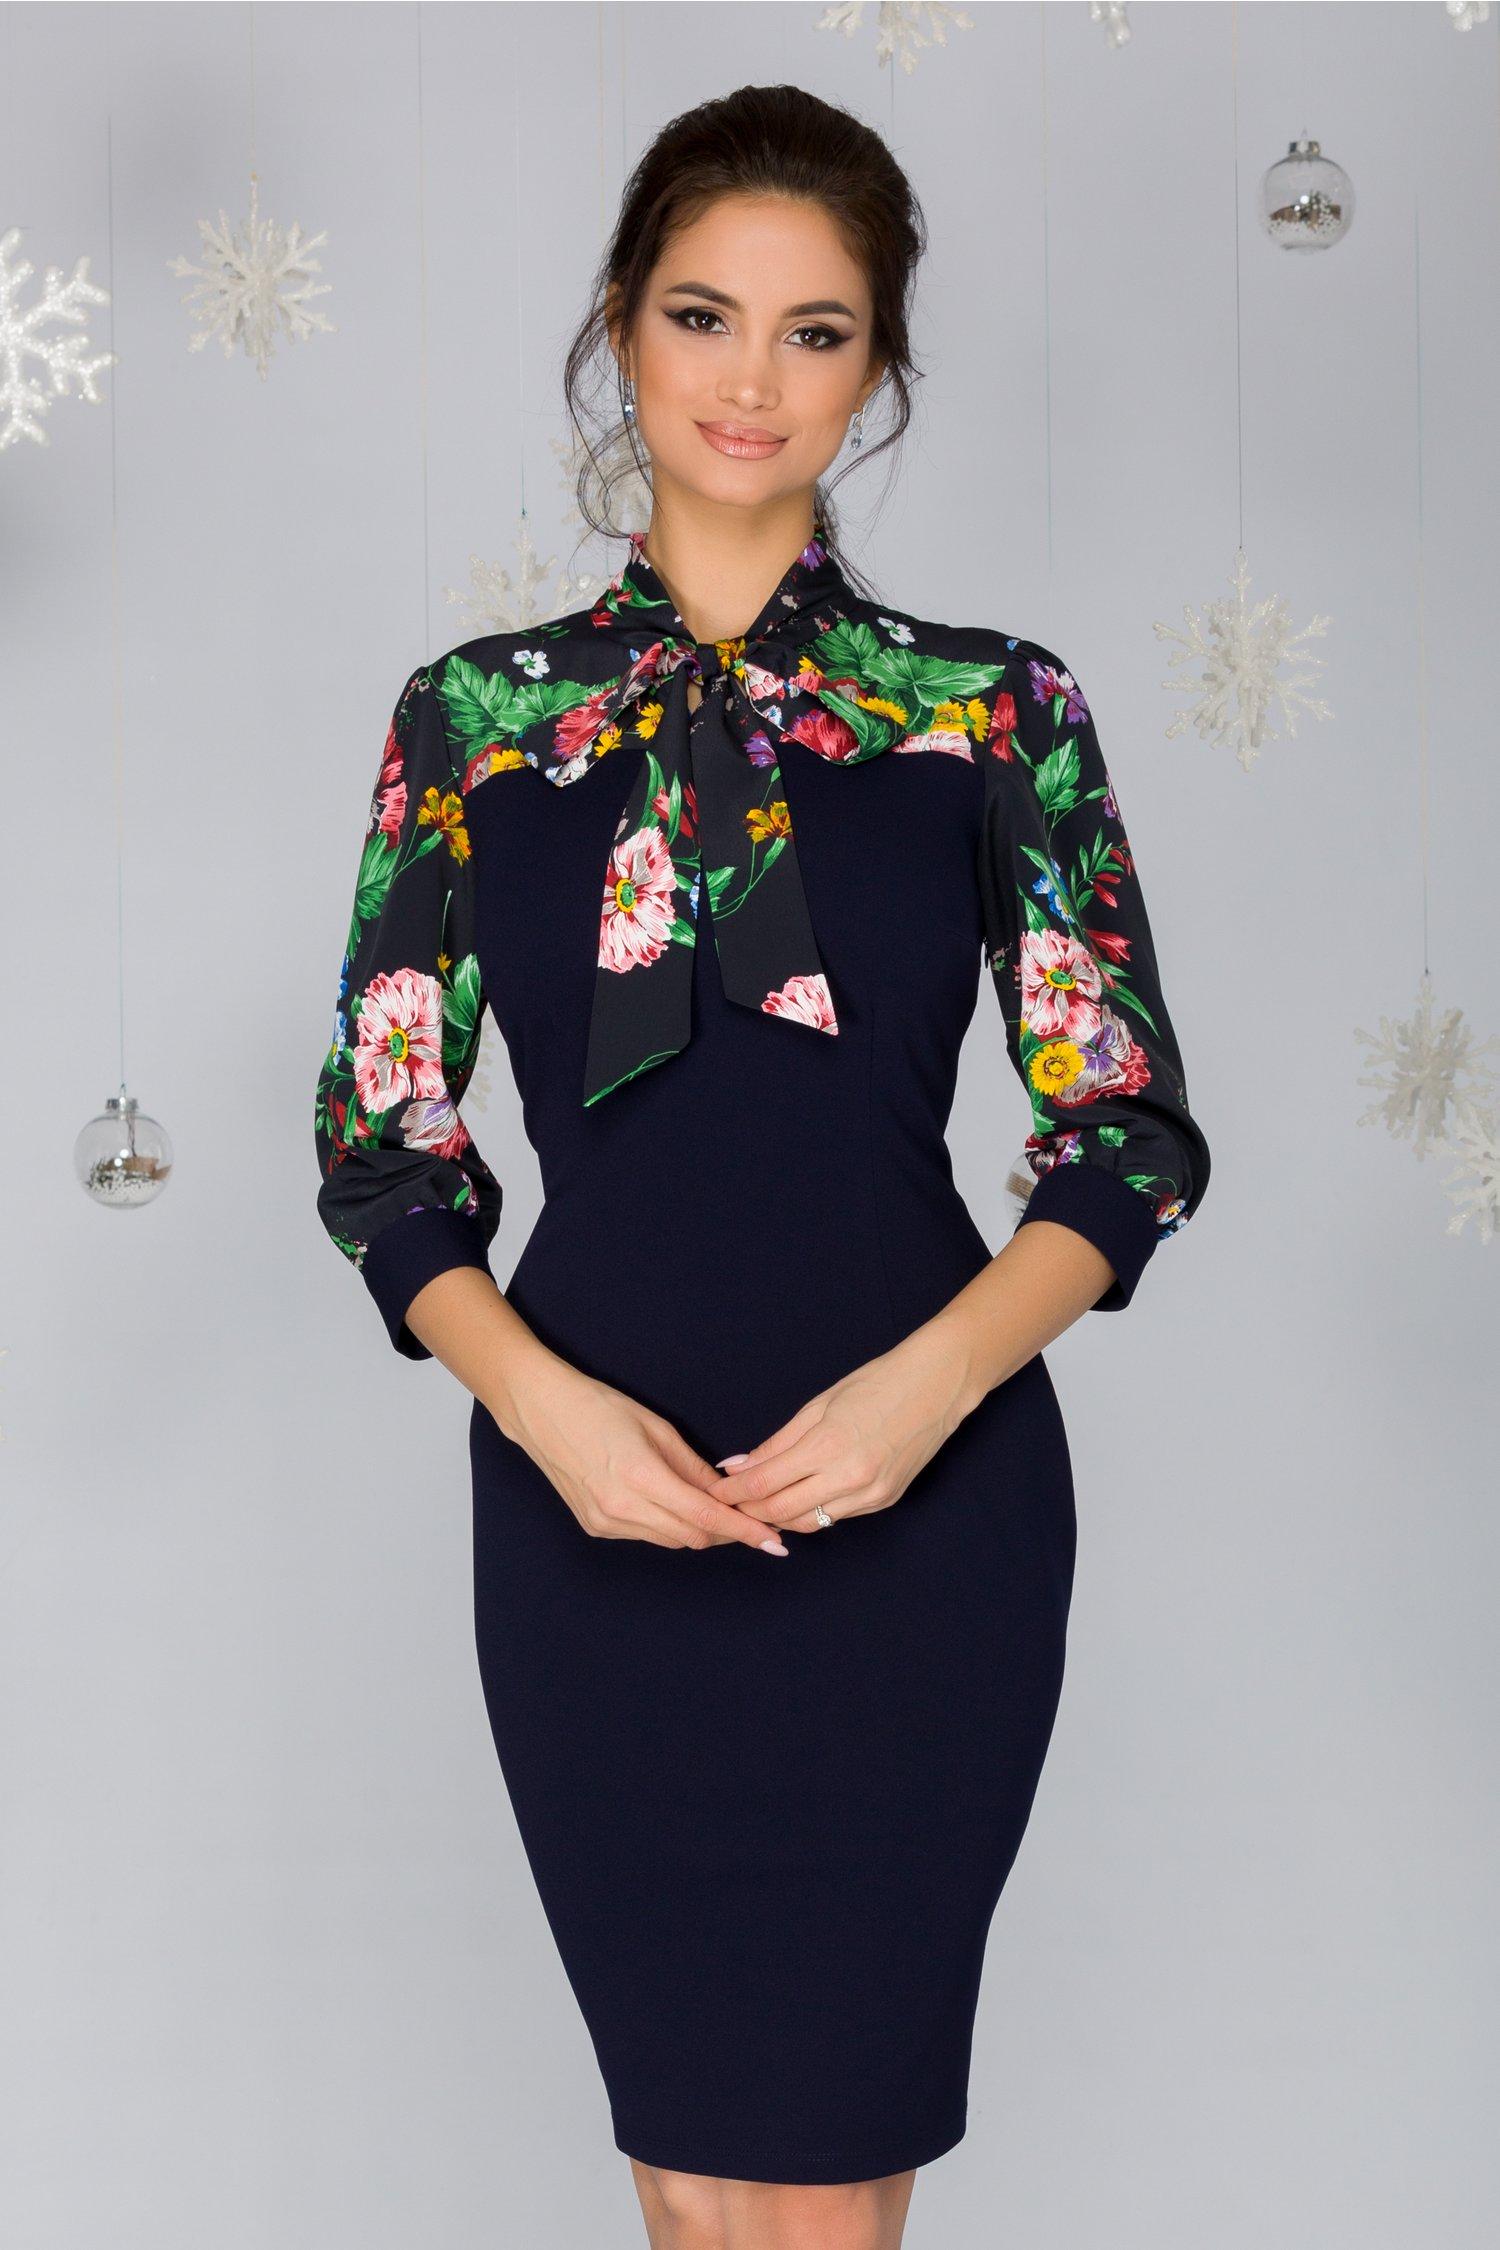 Rochie Aura bleumarin cu imprimeu floral in partea superioara